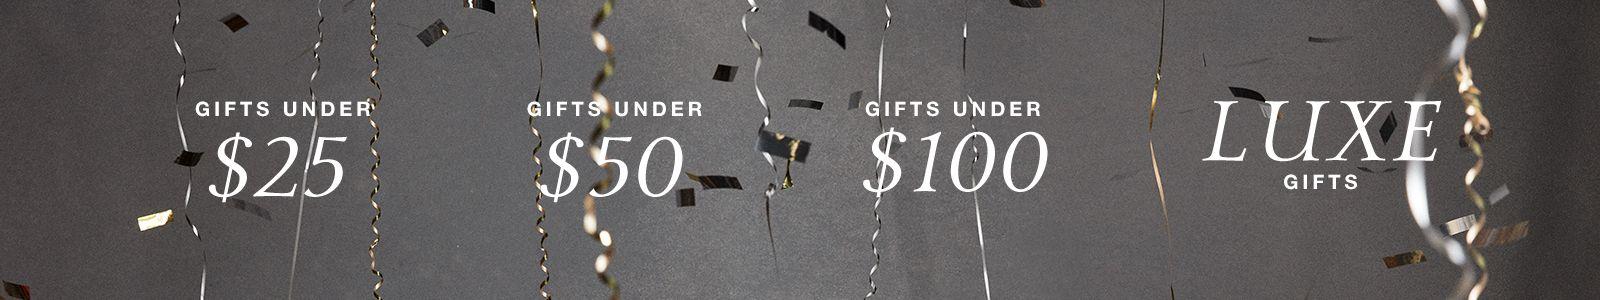 Gifts Under $25, Gifts Under $50, Gifts Under $100, Luxe Gifts